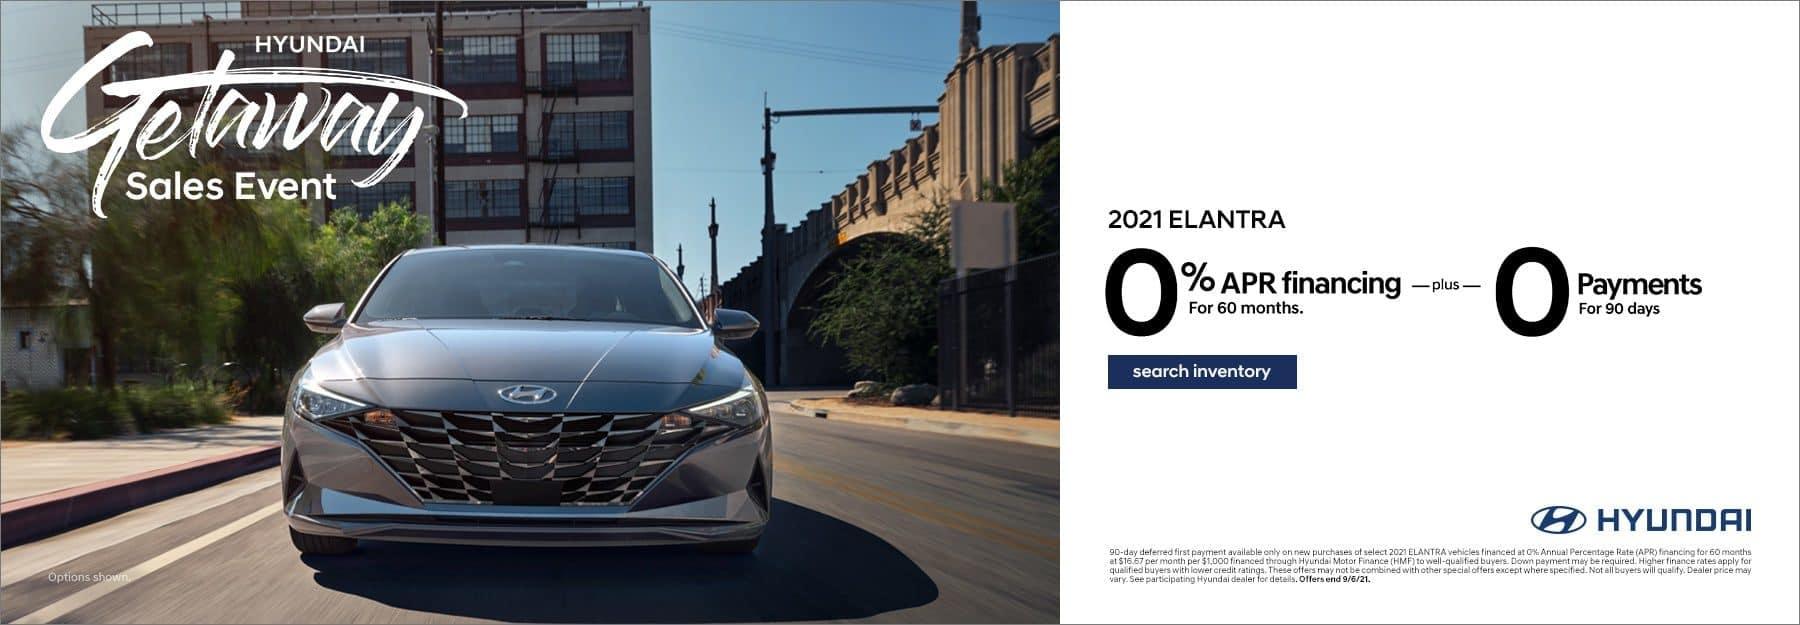 2021 Hyundai Elantra 0% 60mo